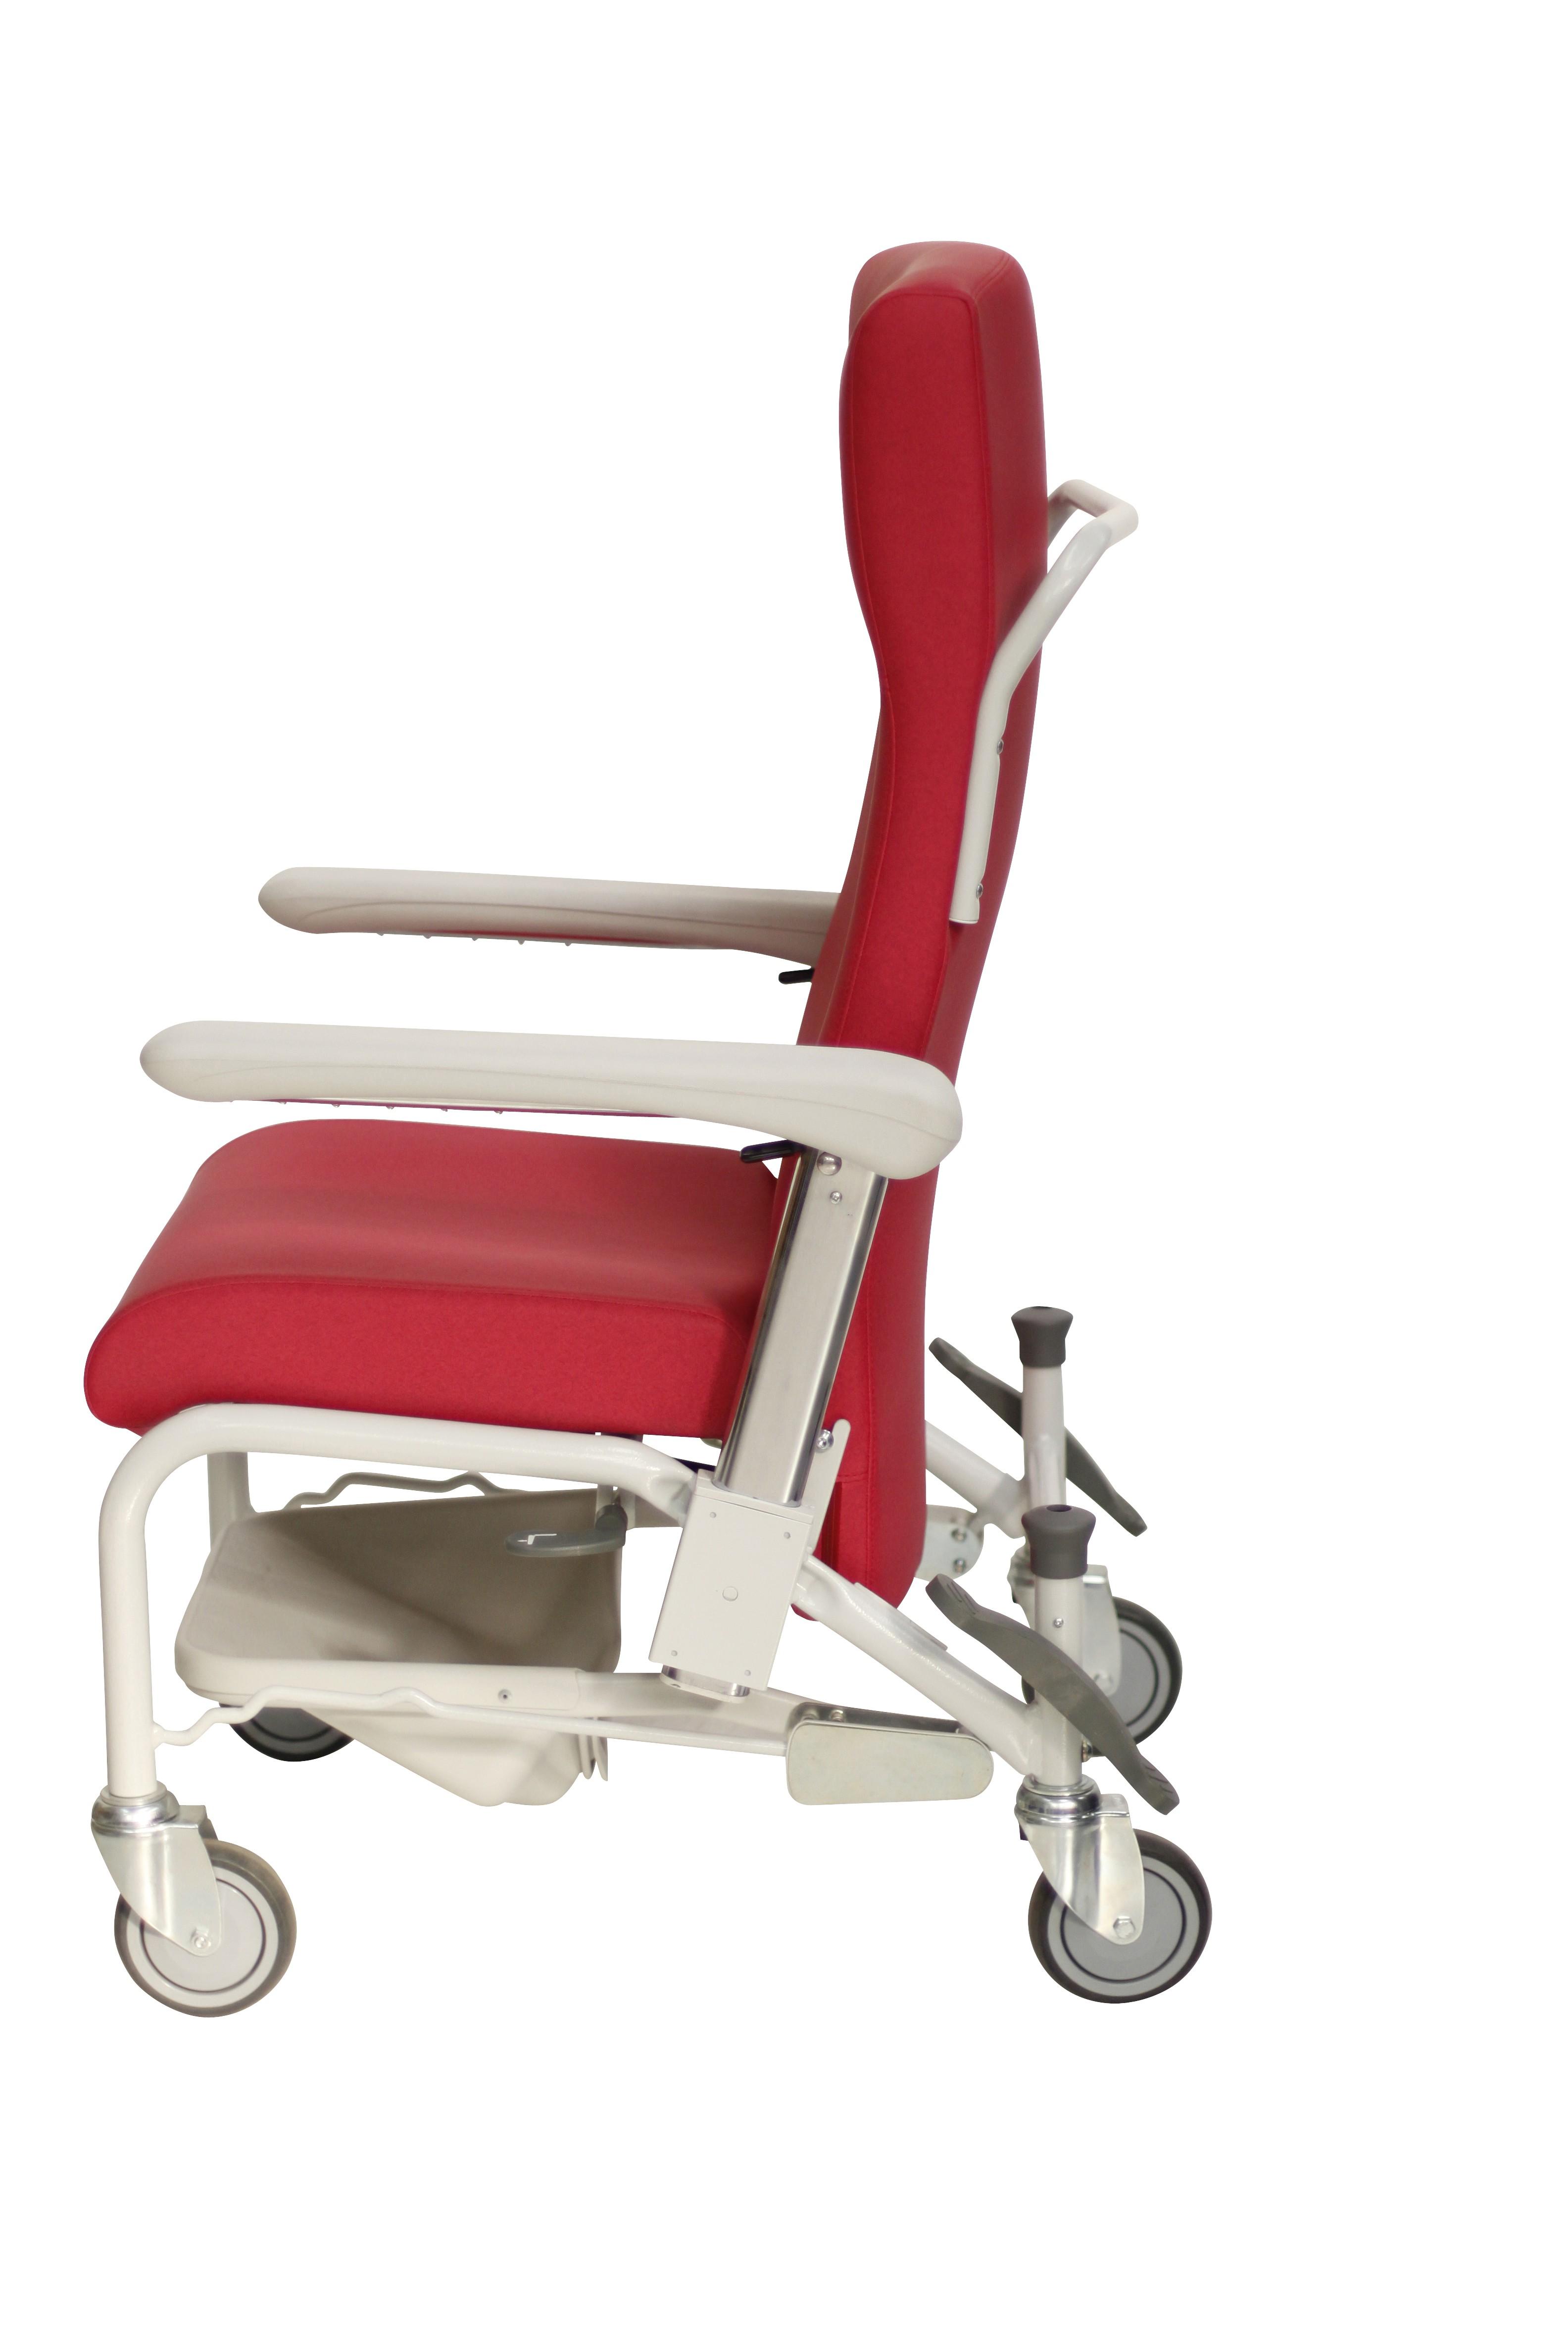 transfer armchair by sotec medical in france. Black Bedroom Furniture Sets. Home Design Ideas